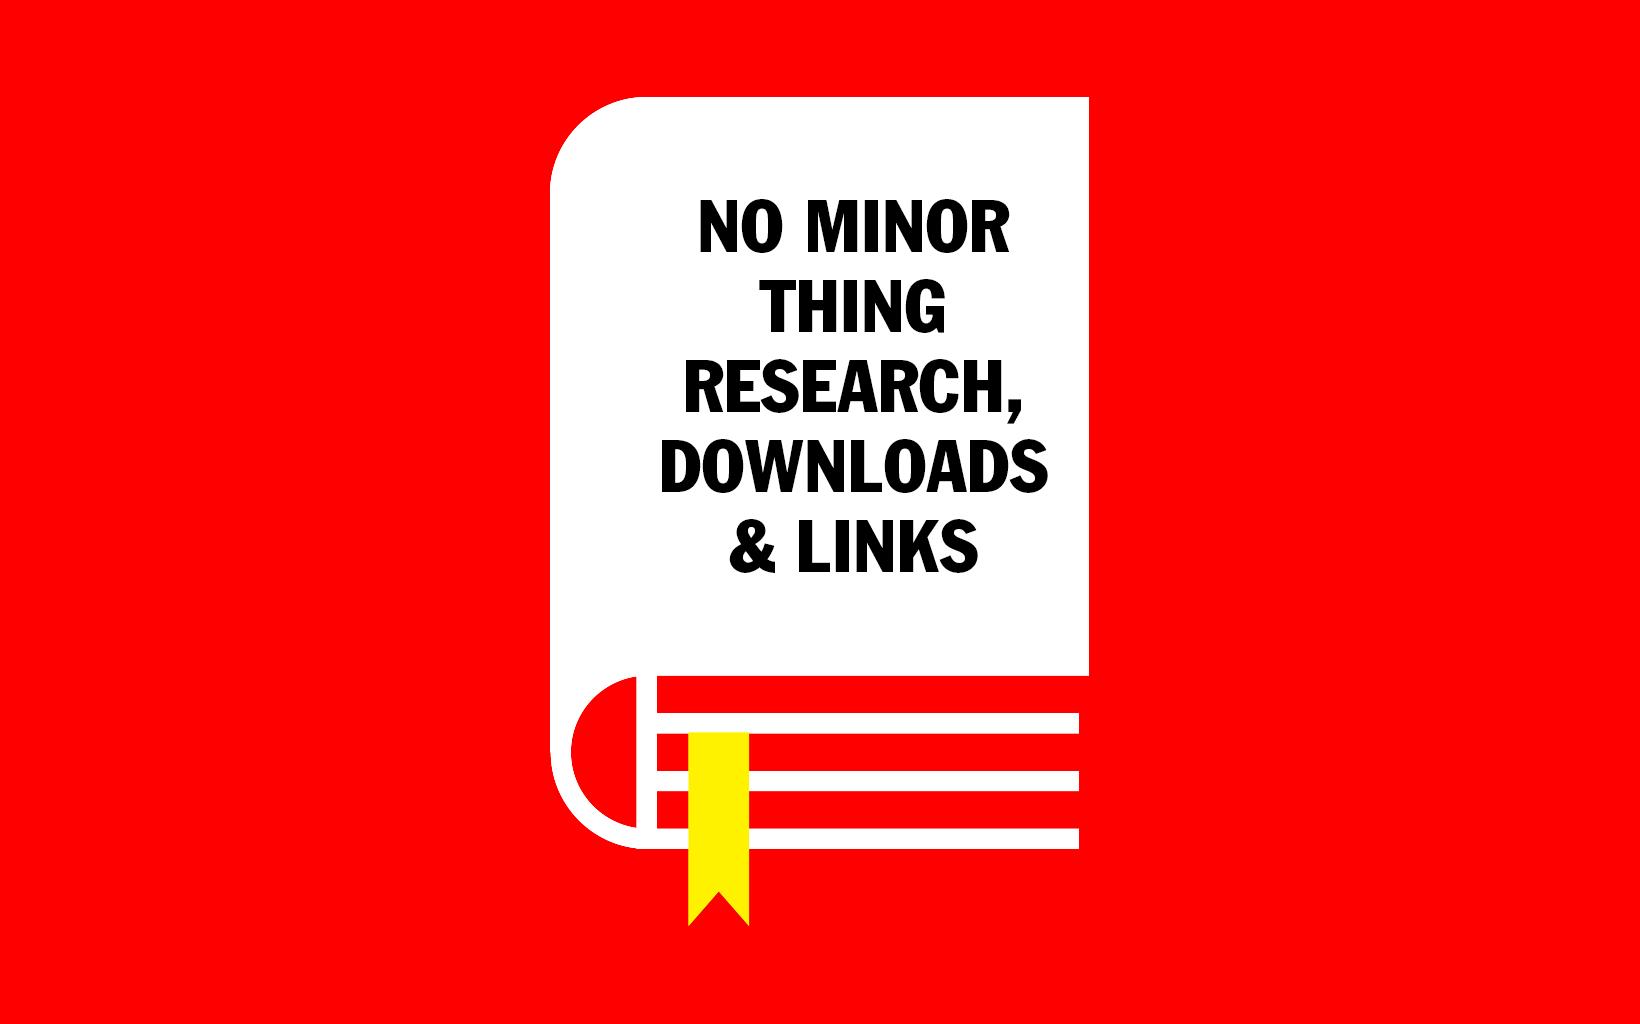 Downloads & Links